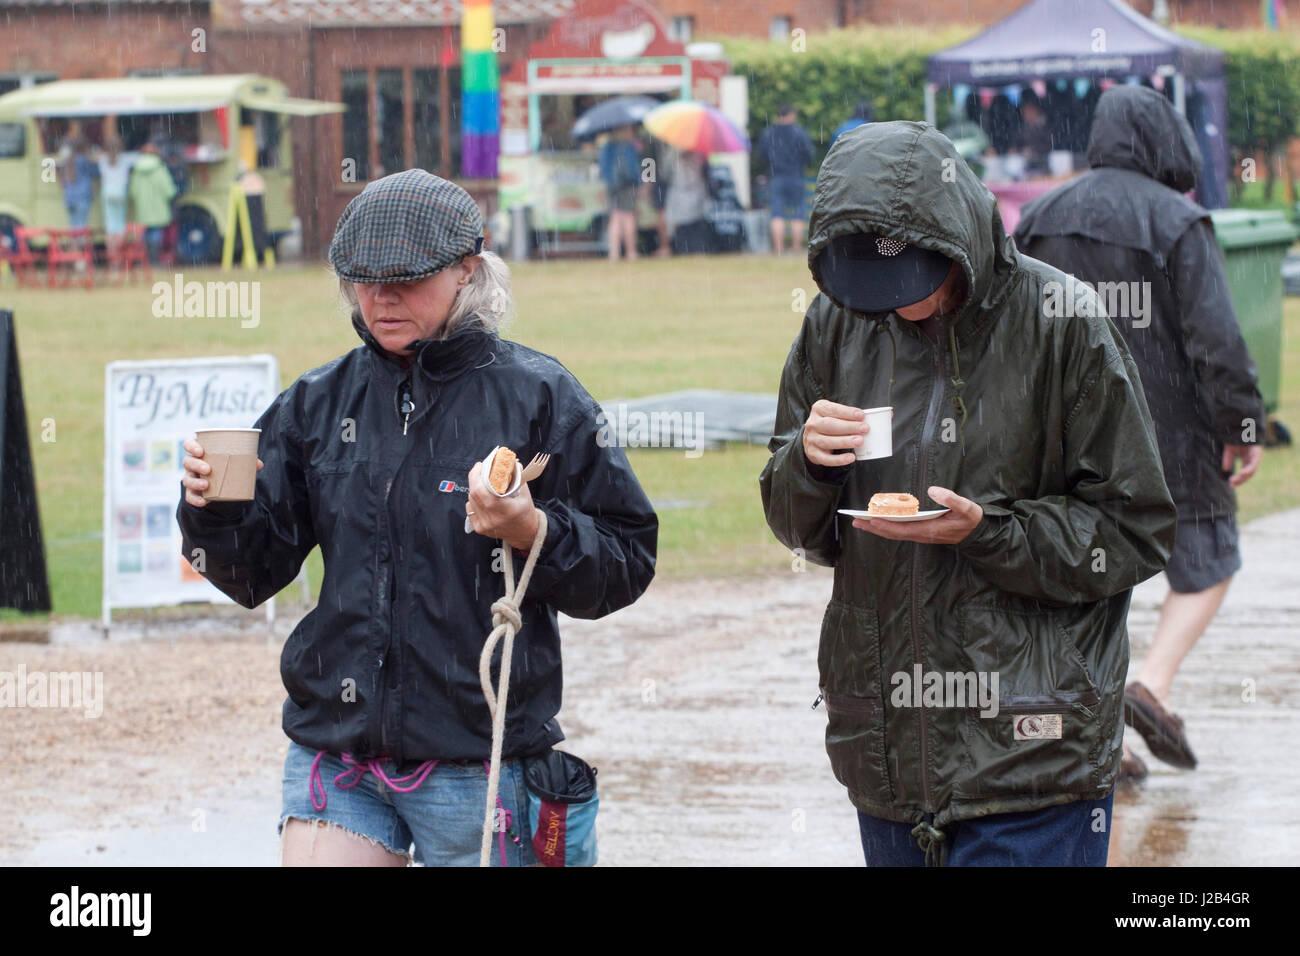 Breakfast in the rain at the Maverick Americana music festival - Stock Image